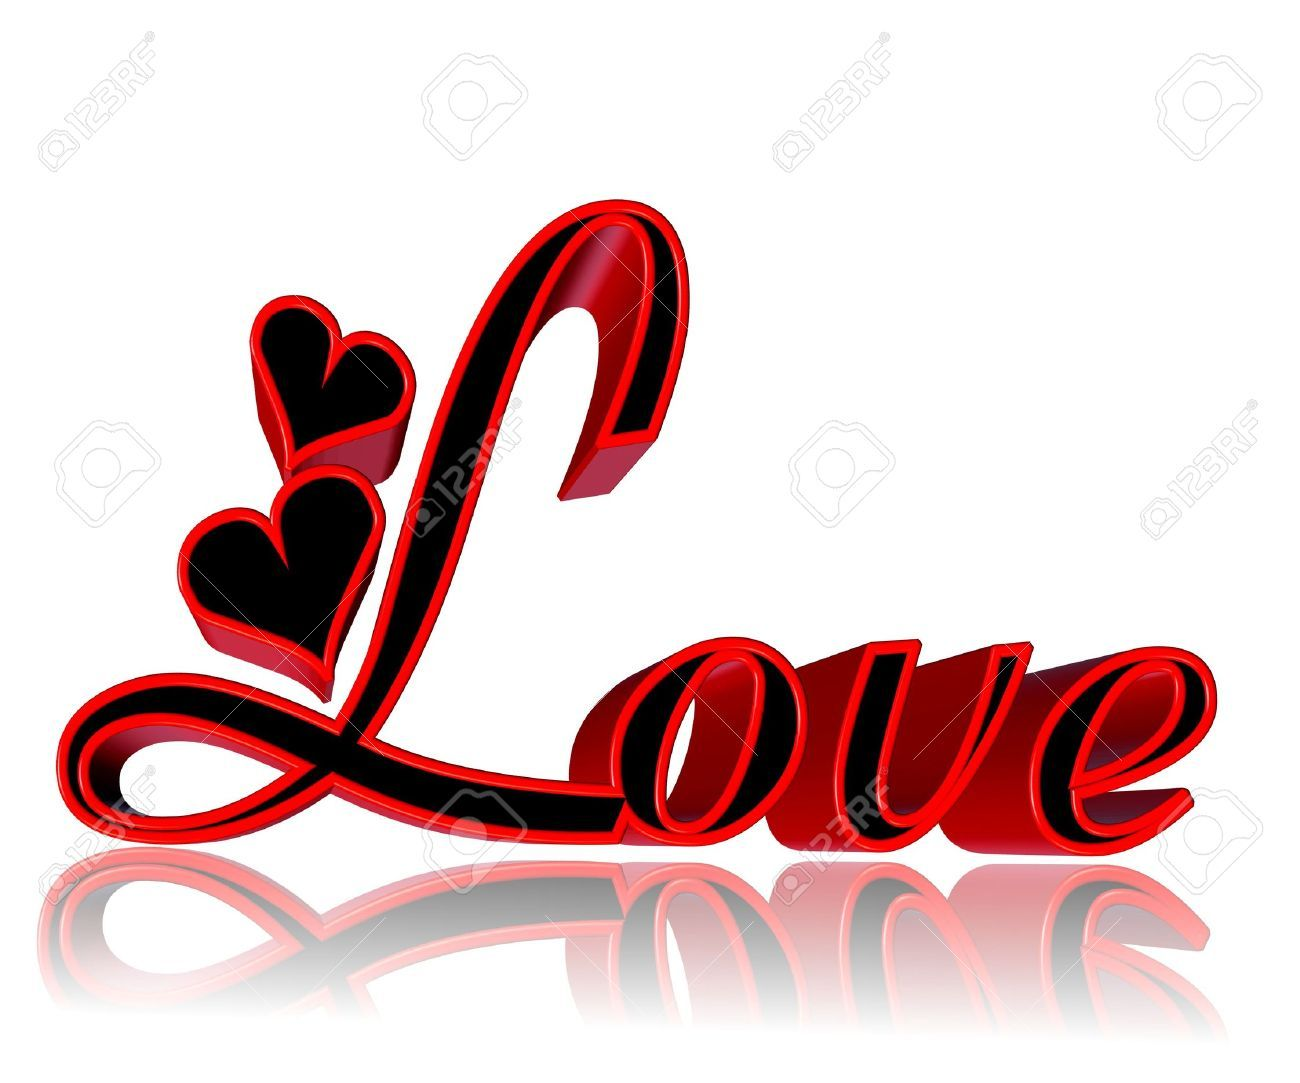 Line Art Love Heart : Love arrow through the heart blood by margarita art spreadshirt